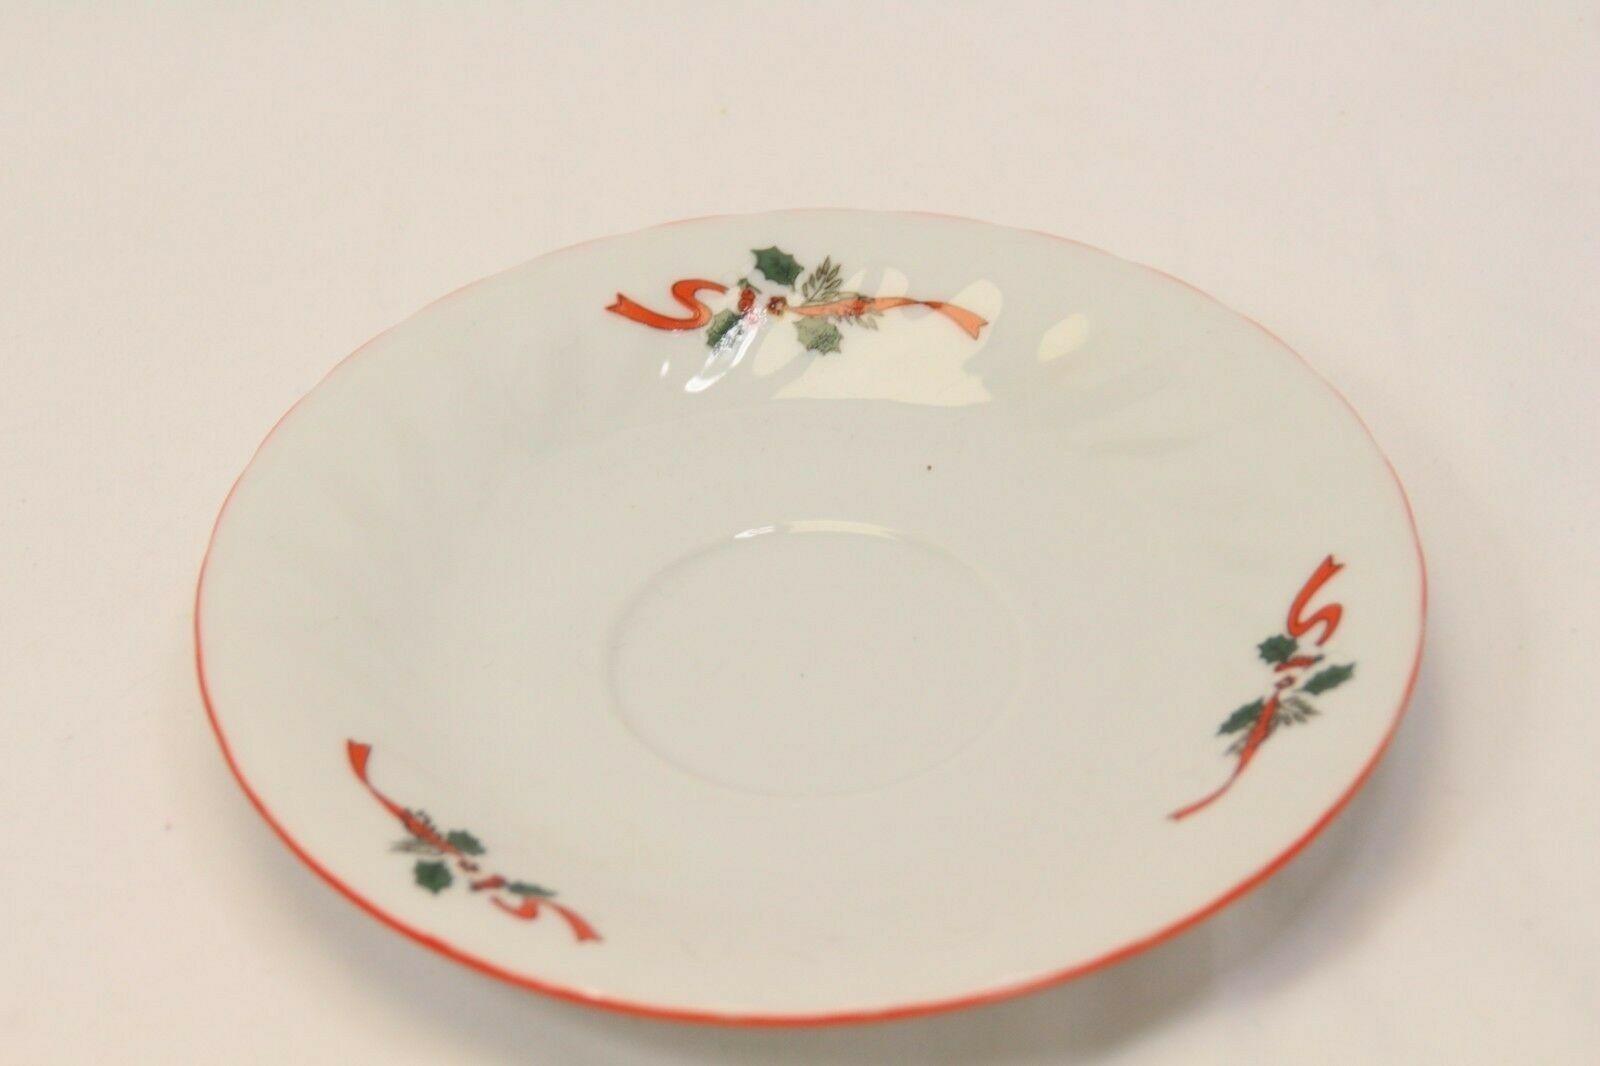 Kopin Xmas Pleasure Dinner Plates Scalloped Rim Lot of 16 image 10